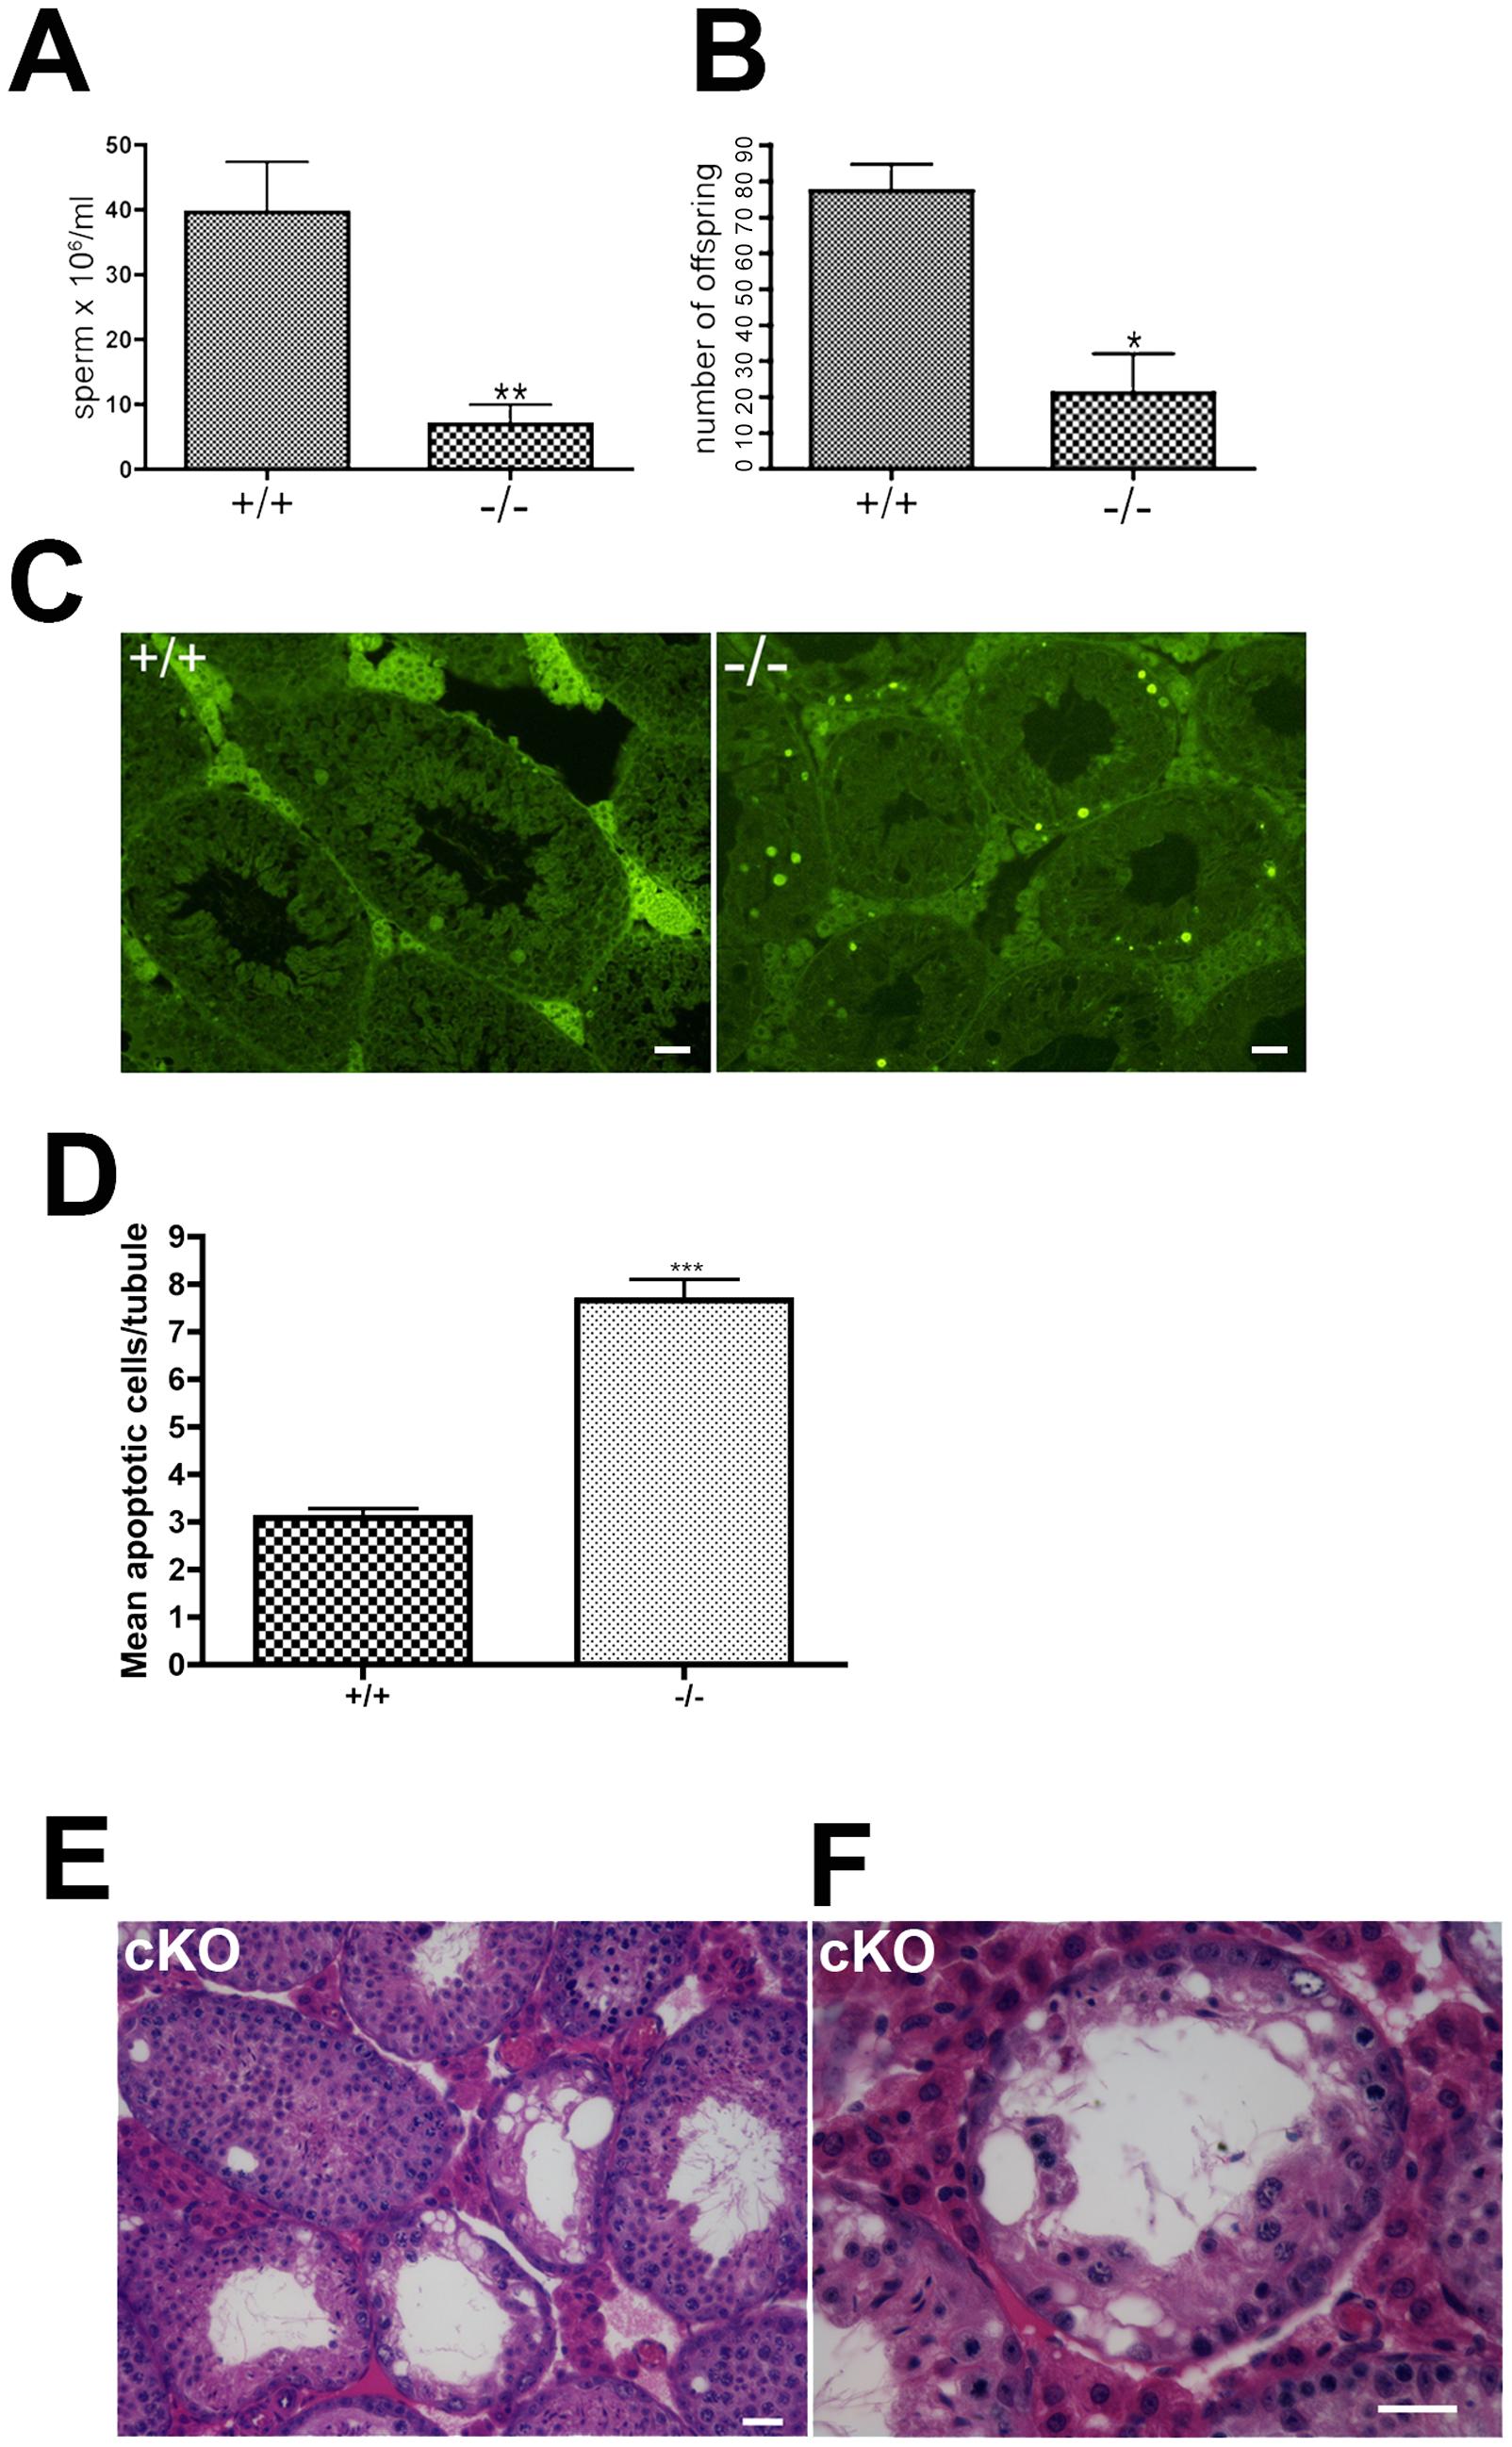 Oligospermia and decreased fertility in <i>Chtf18</i>-null mice.